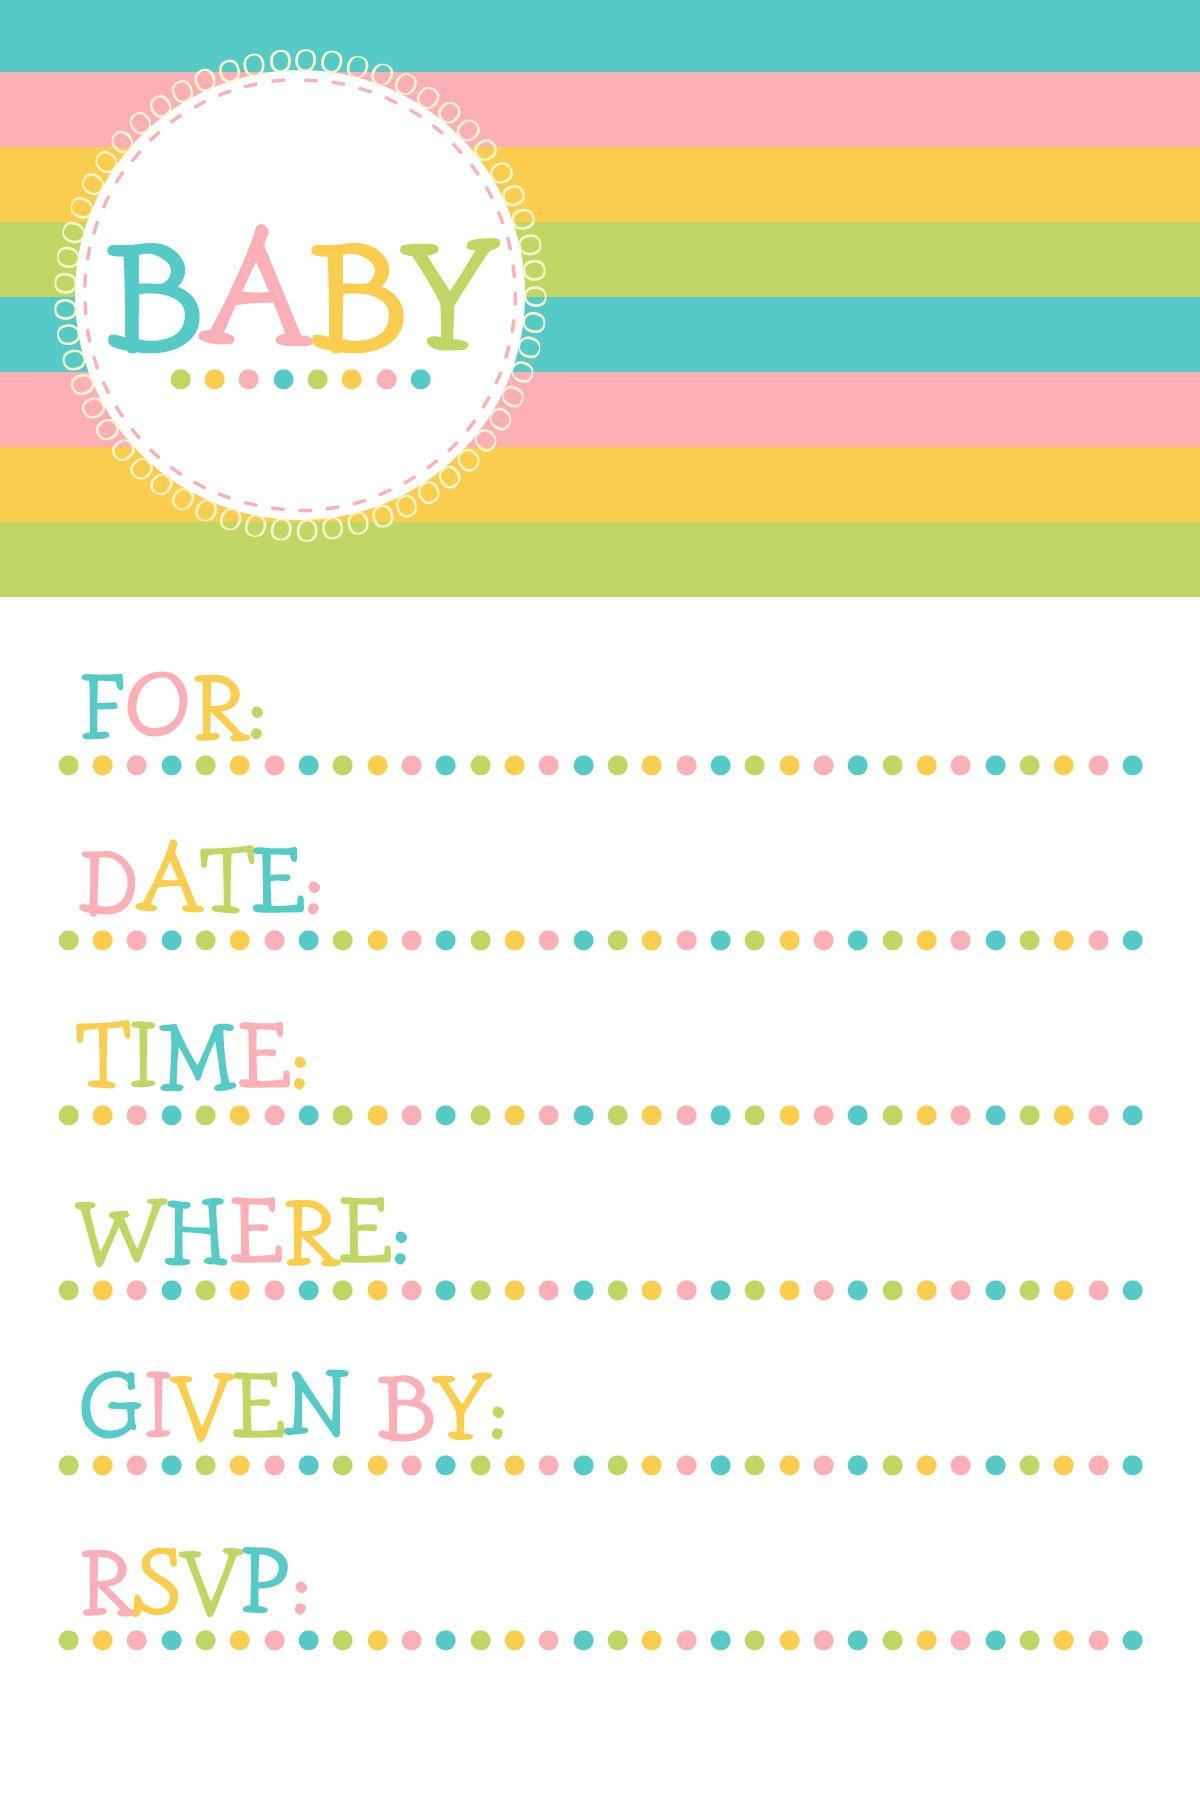 25 Adorable Free Printable Baby Shower Invitations - Make Baby Shower Invitations Online Free Printable